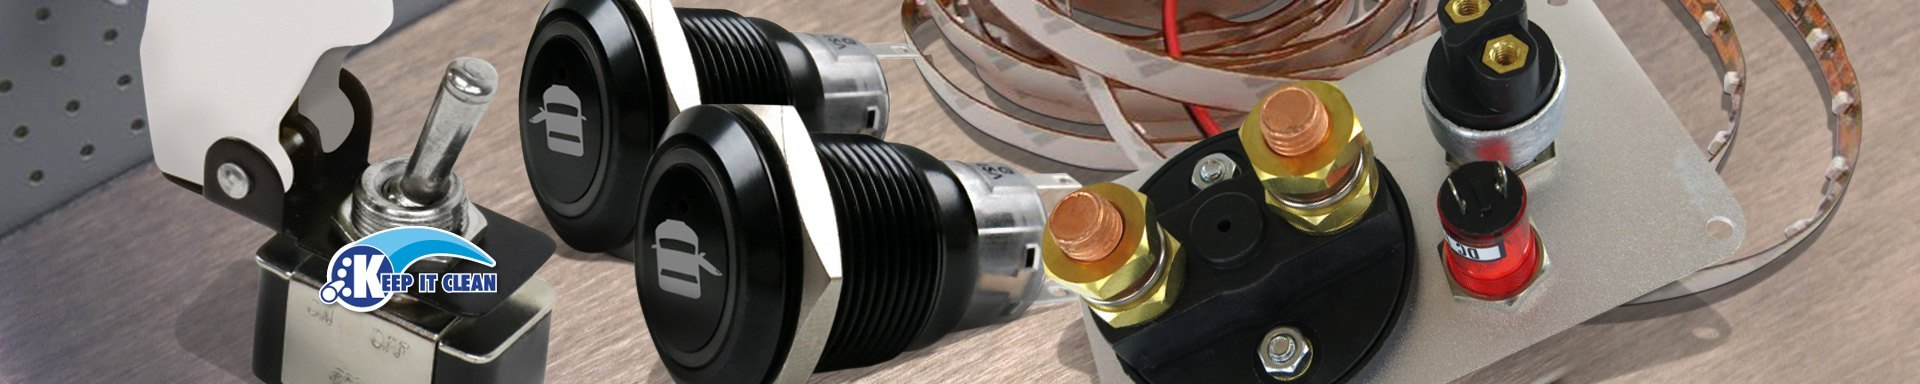 Keep It Clean Wiring Pro 15